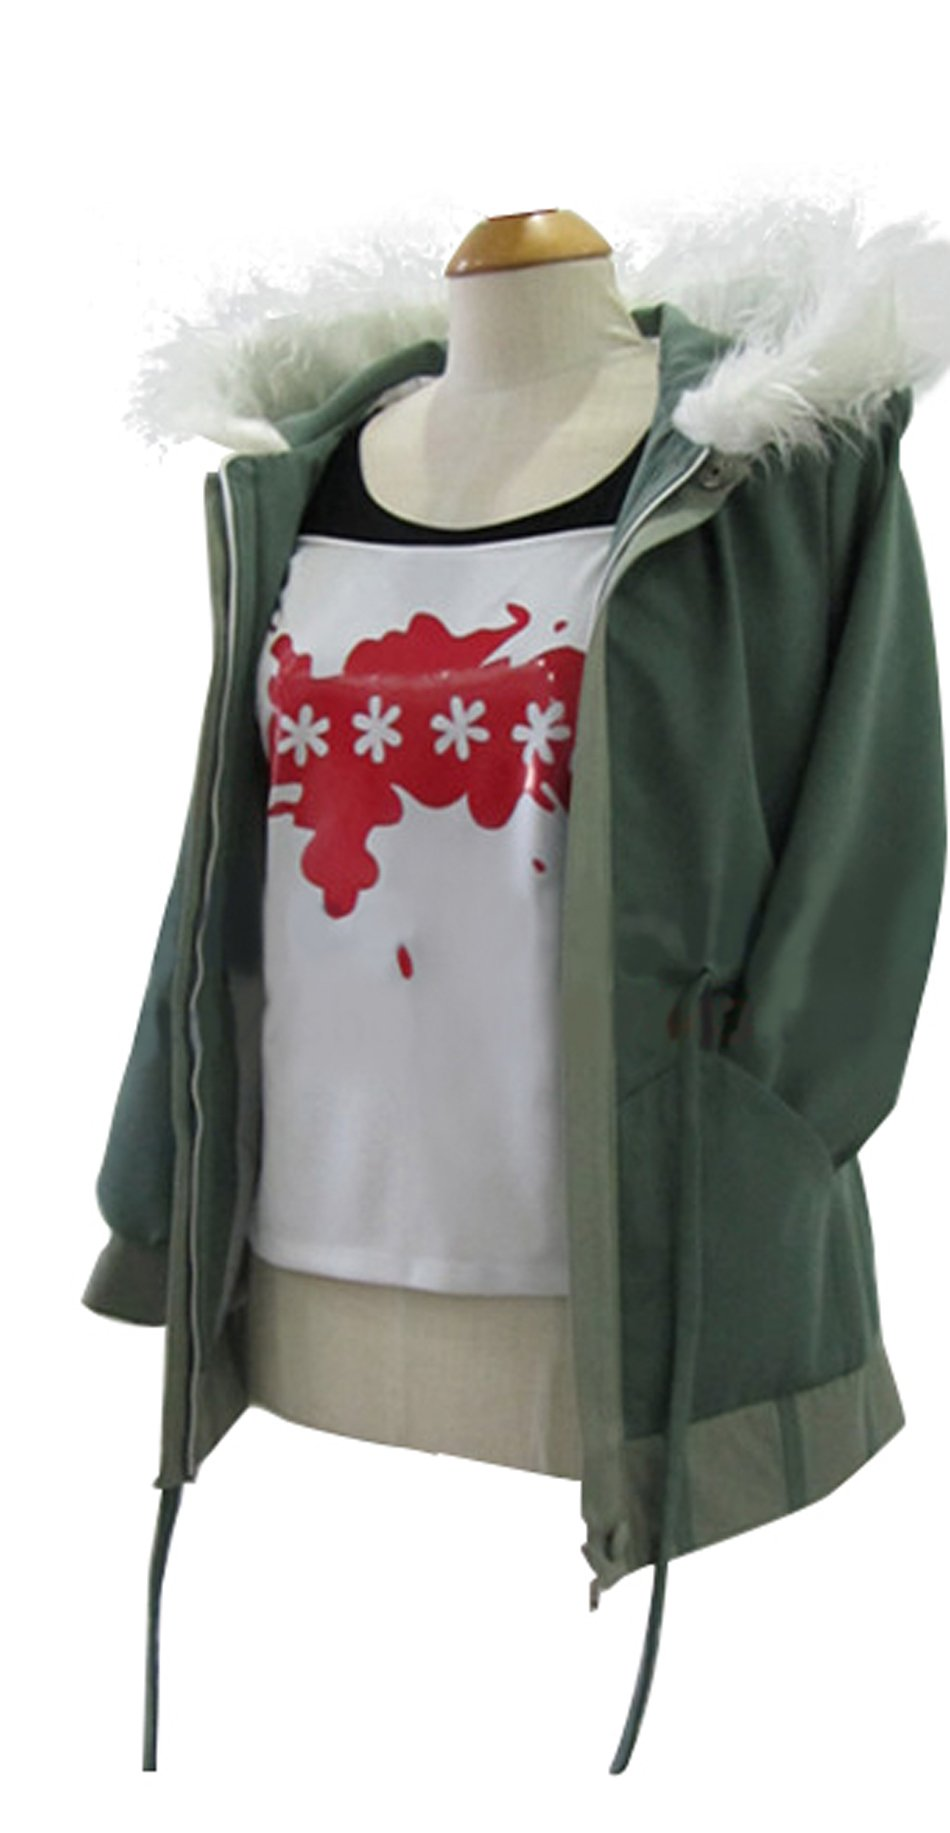 Xcostume Persona Futaba Costume Deluxe Cotton Hooded Coat Fashion Jacket XL by Xcostume